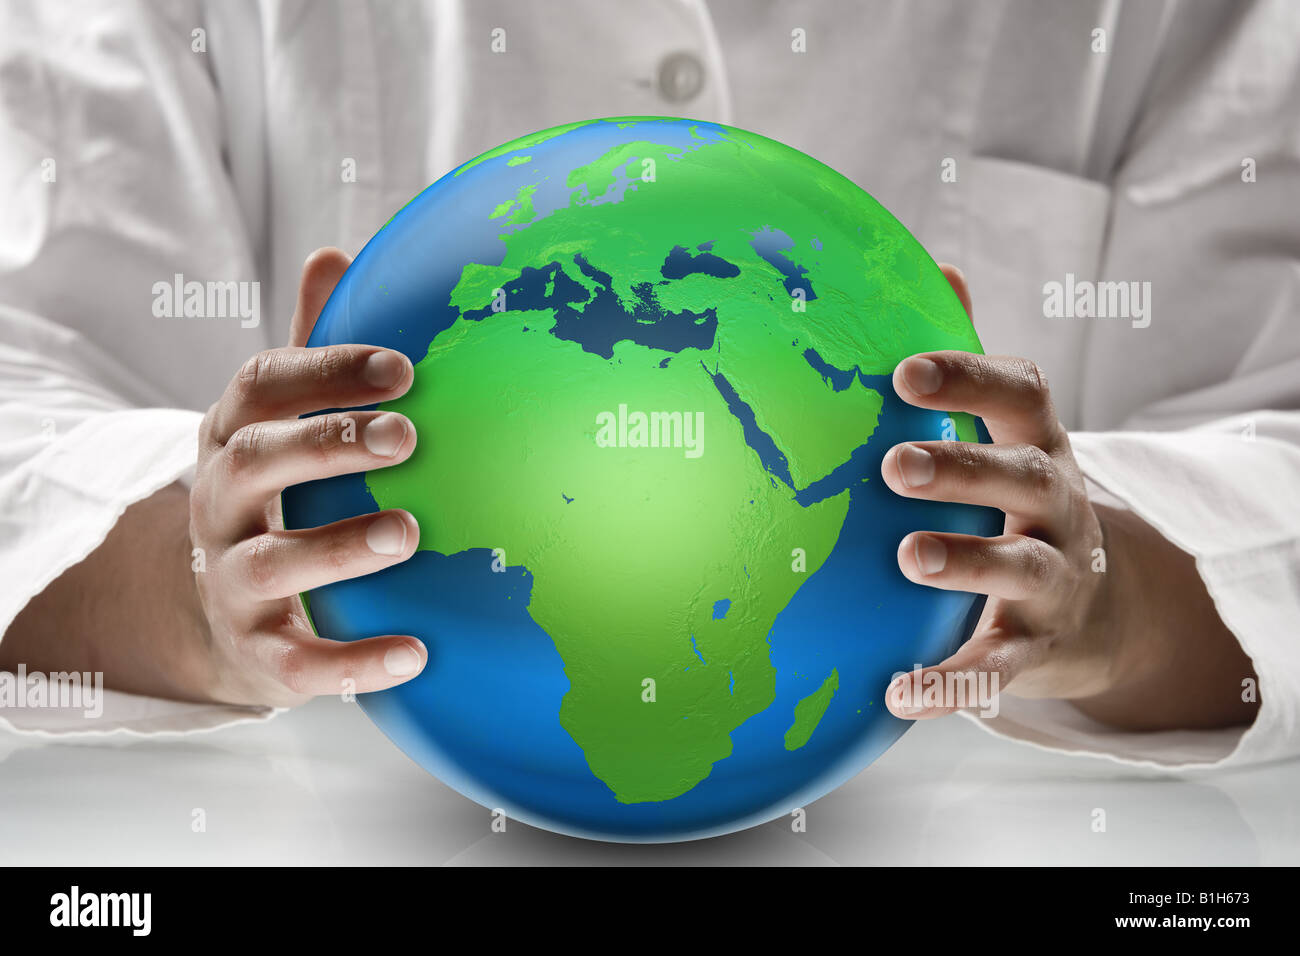 Scientist holding a globe Photo Stock